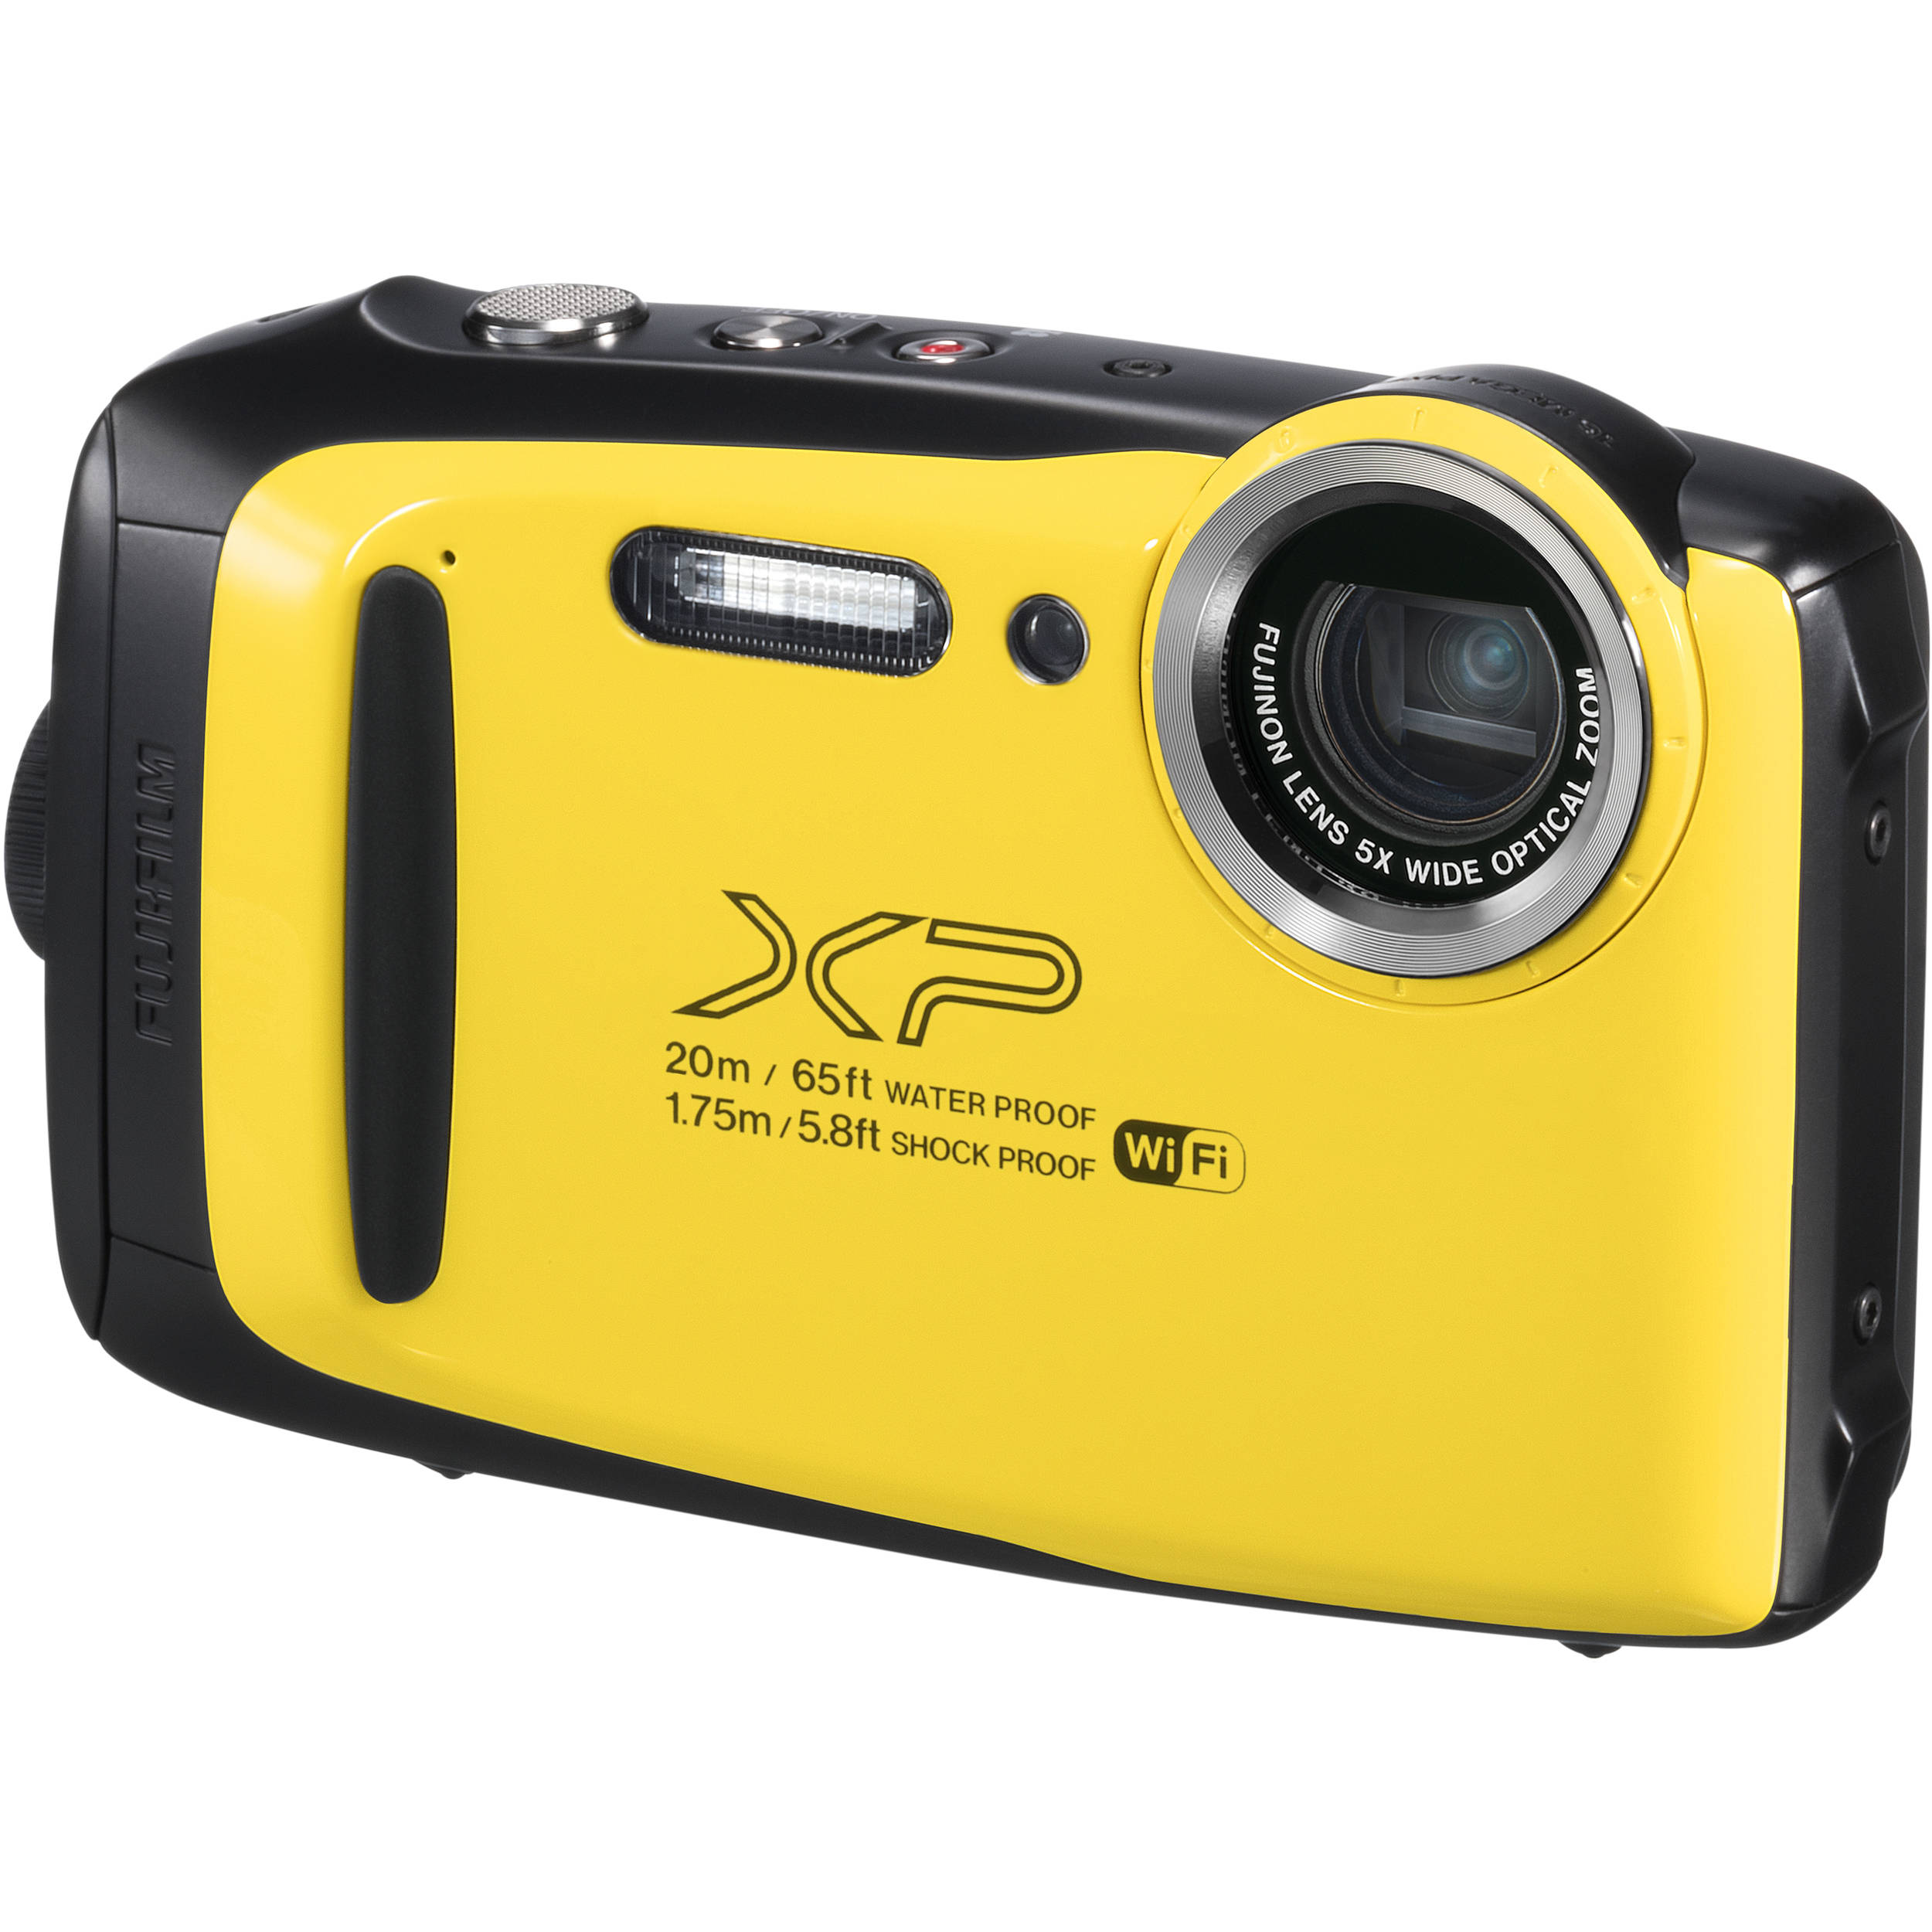 Fujifilm Finepix Xp130 Digital Camera Yellow 600019828 Bh Nokia 130 Kamera New